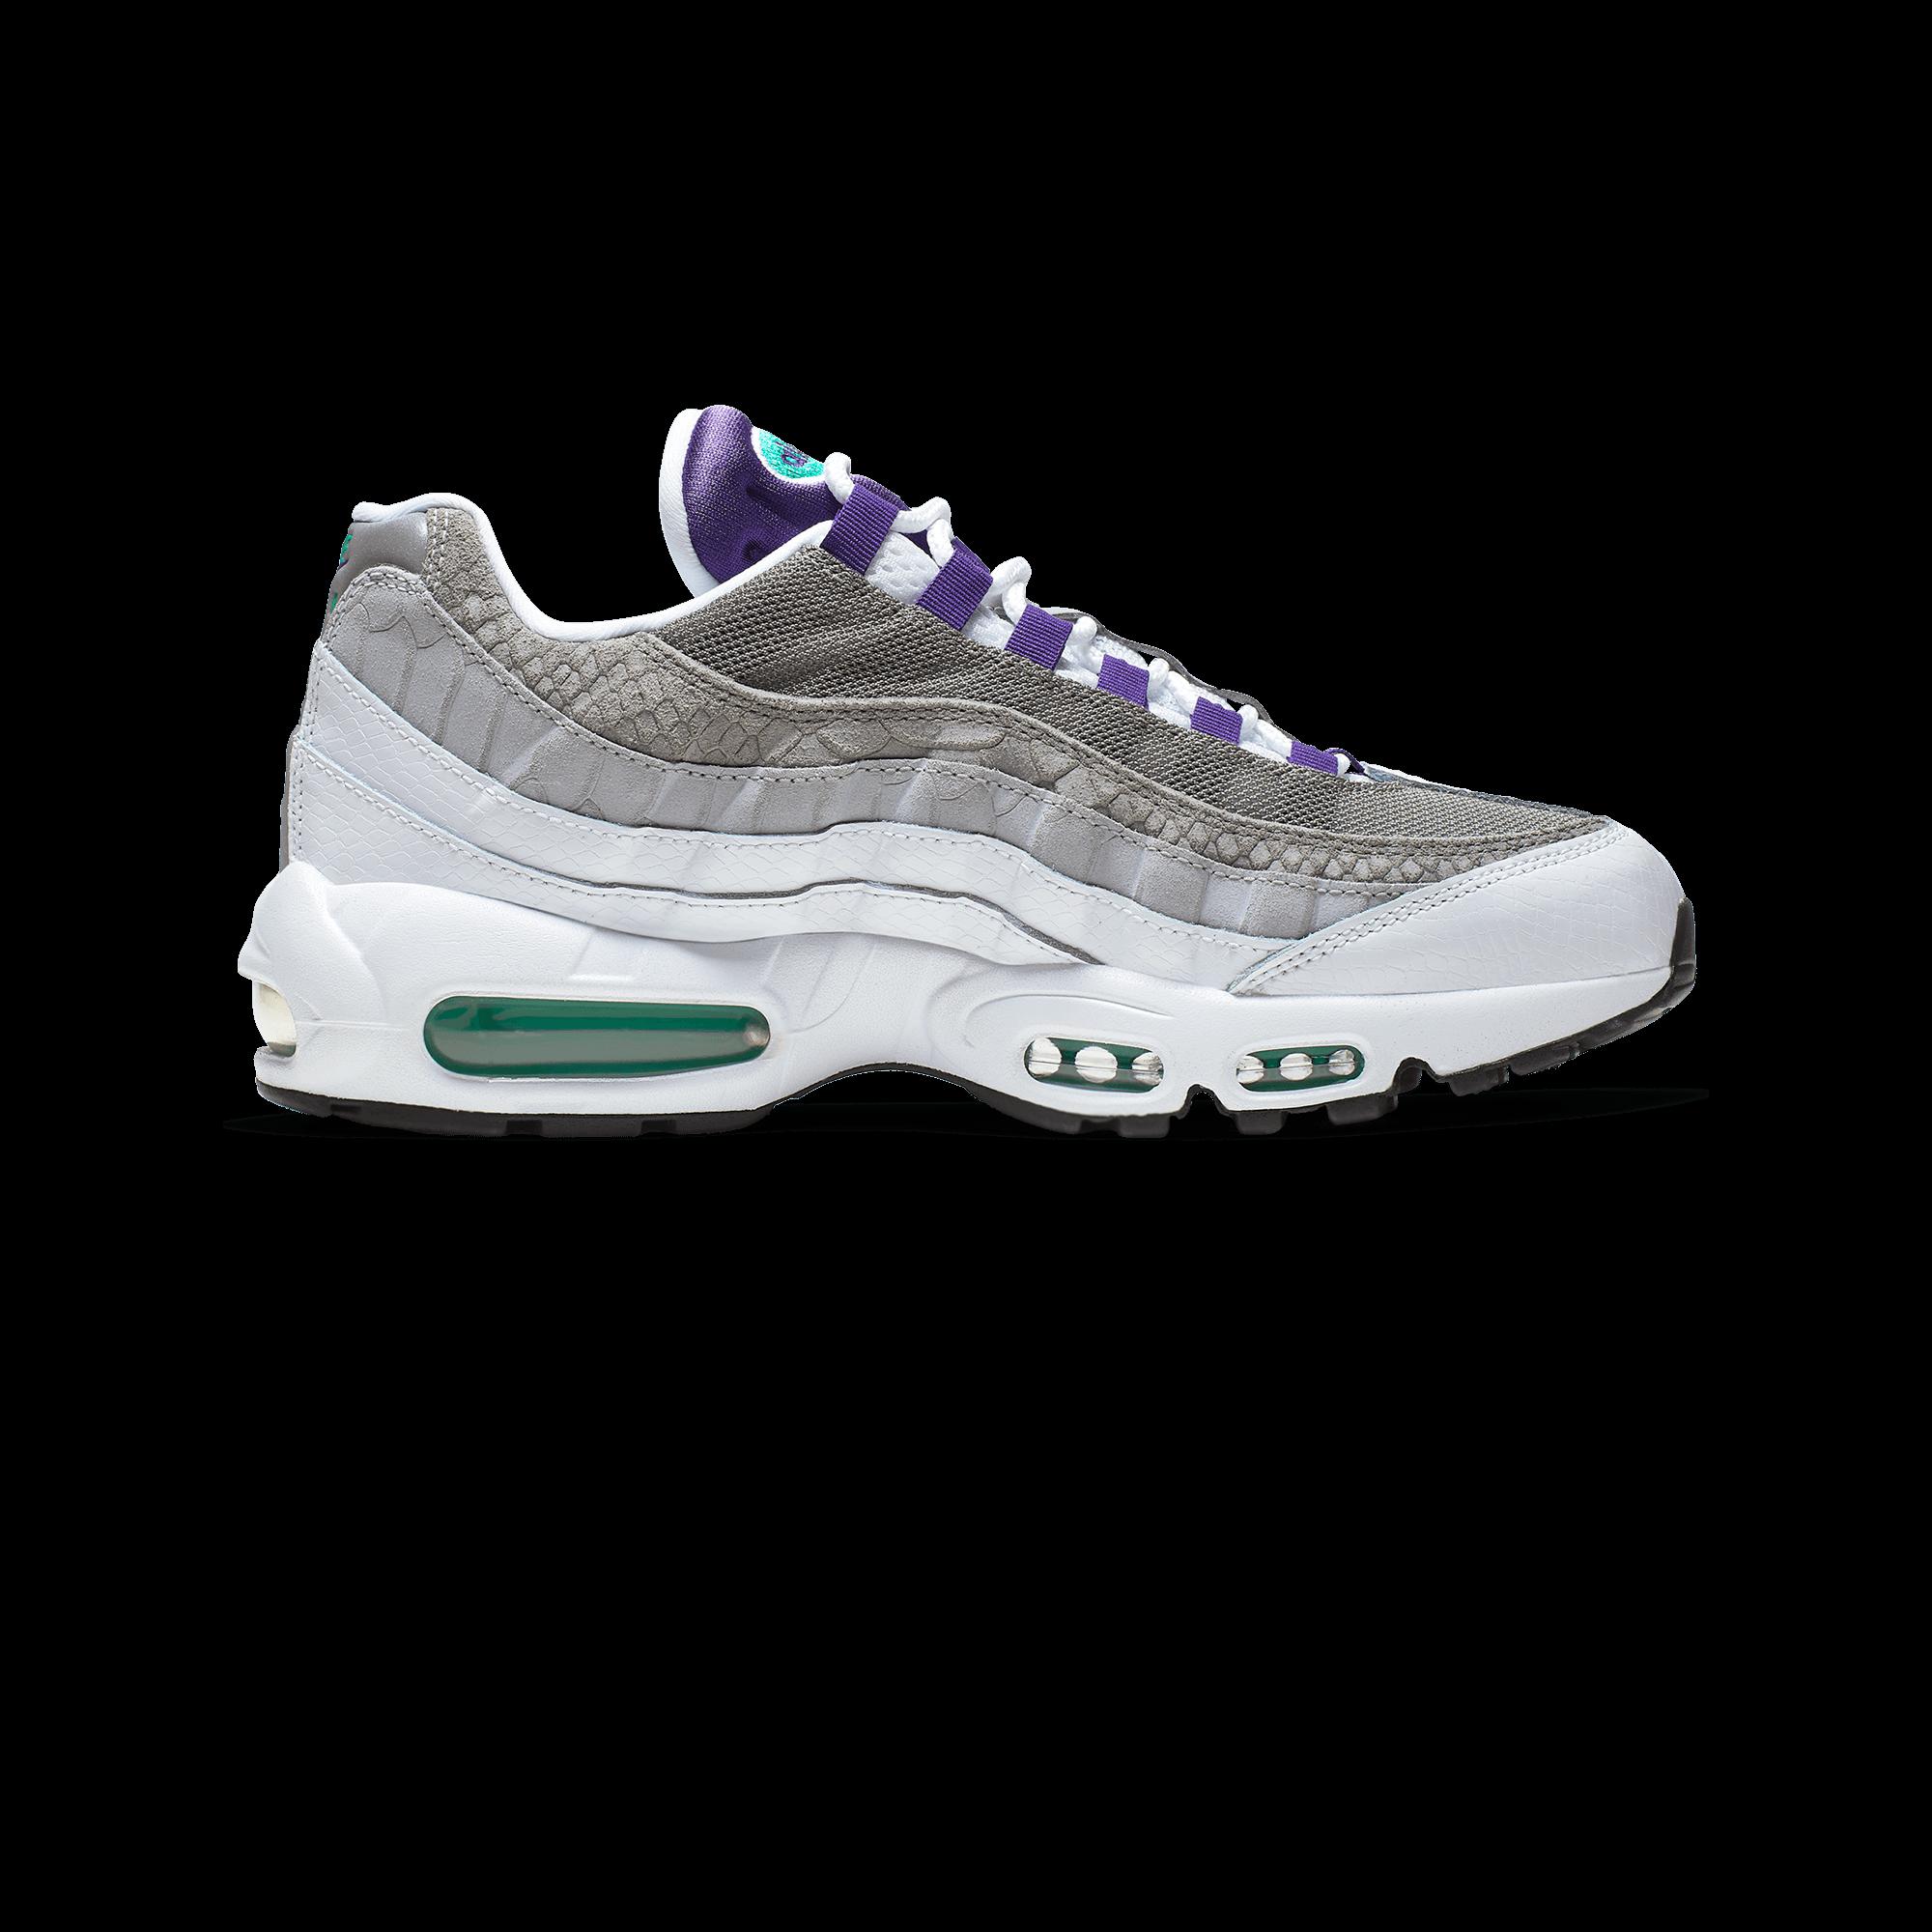 uk availability 9953c 694e4 Nike Air Max 95 LV8 white / court purple / emerald green - Men |  Holypopstore.com